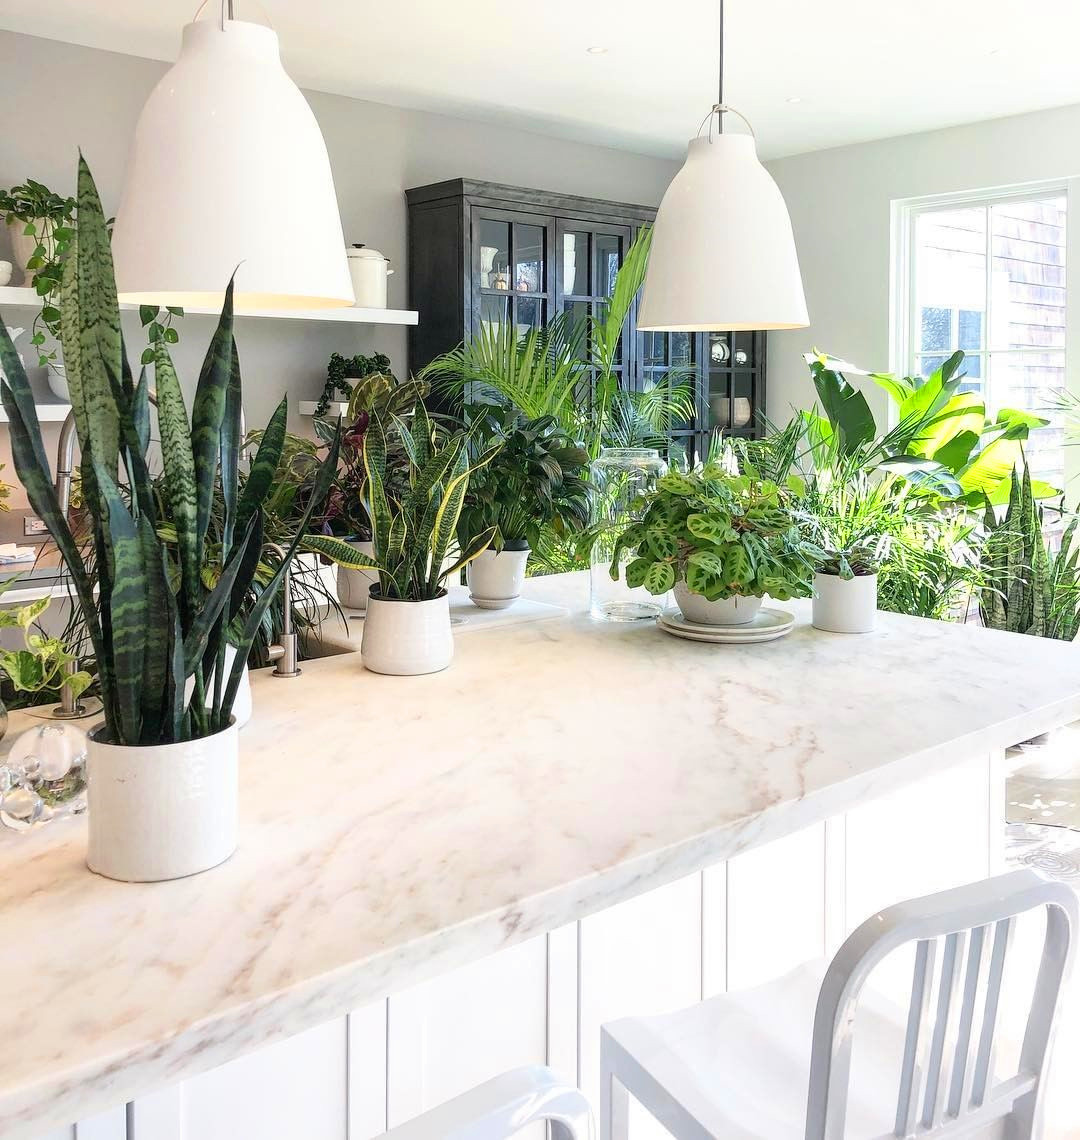 55 Marvelous Indoor Plants Design Ideas To Freshen Your Home